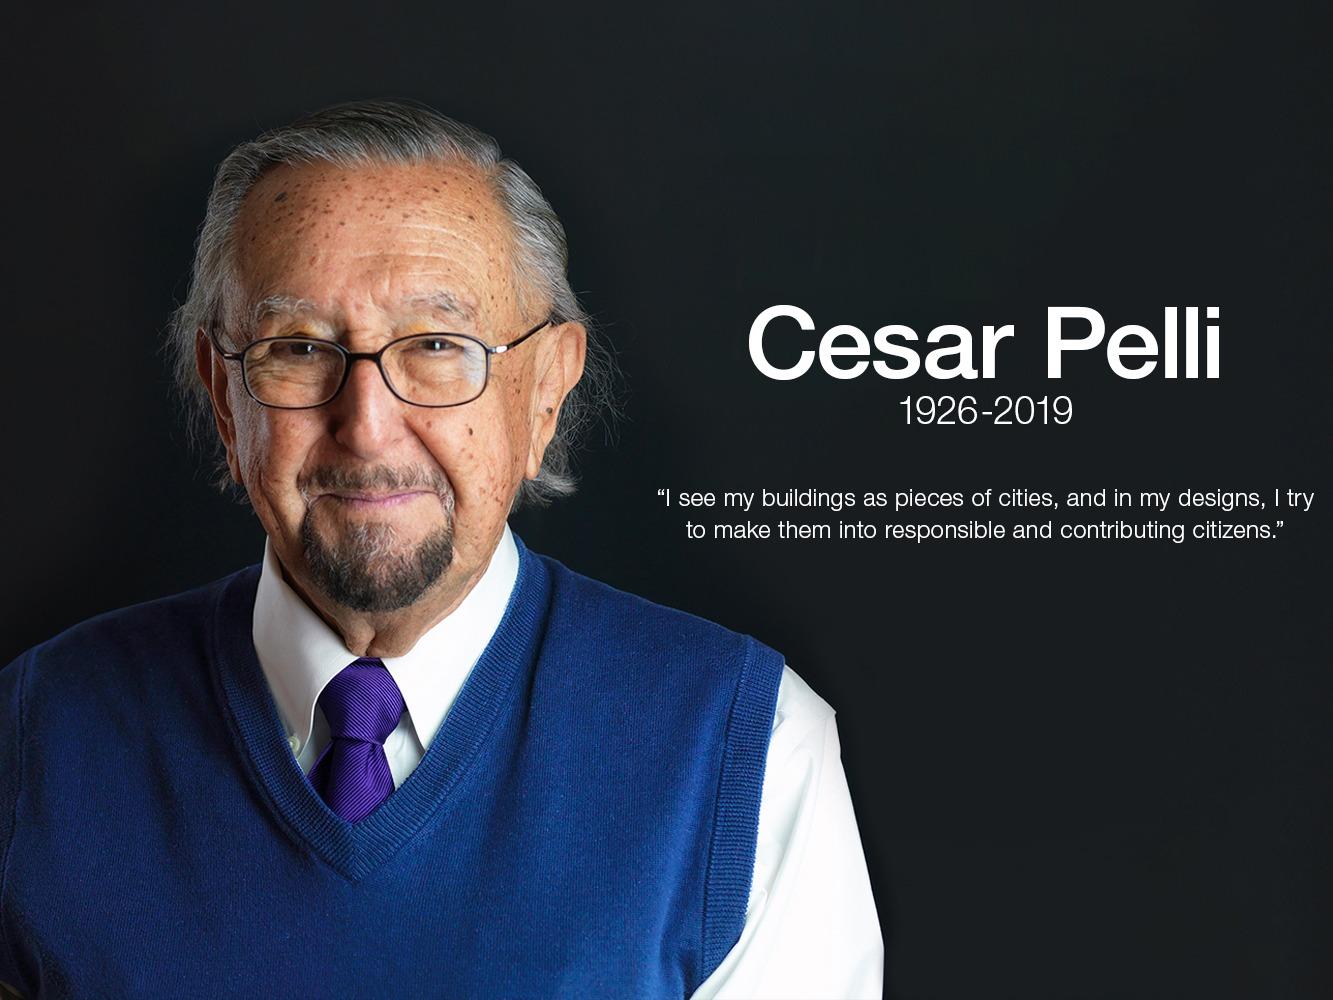 César Pelli / Pelli Clarke Pelli Architects